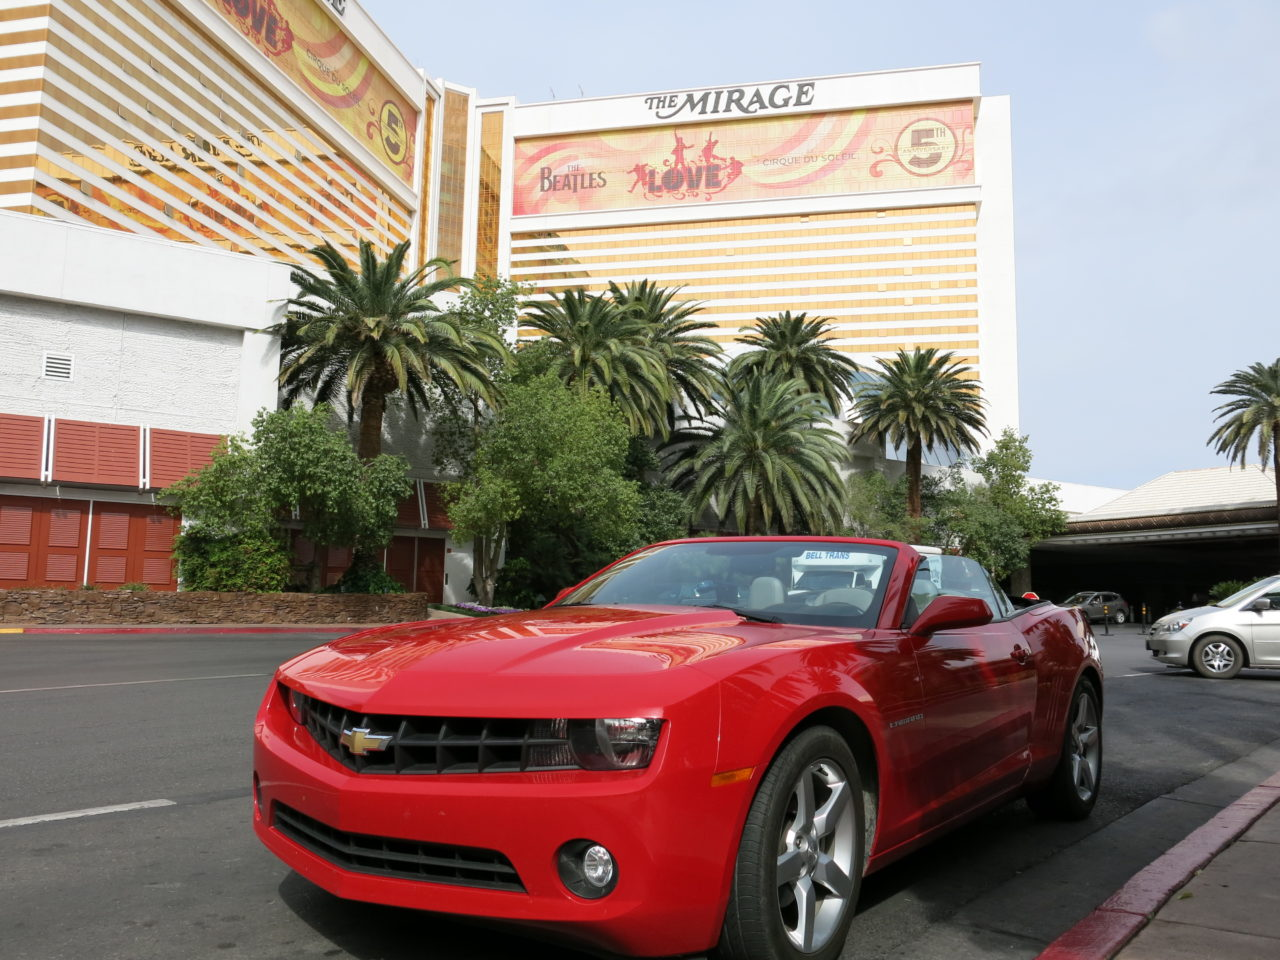 Convertible Car Las Vegas Strip